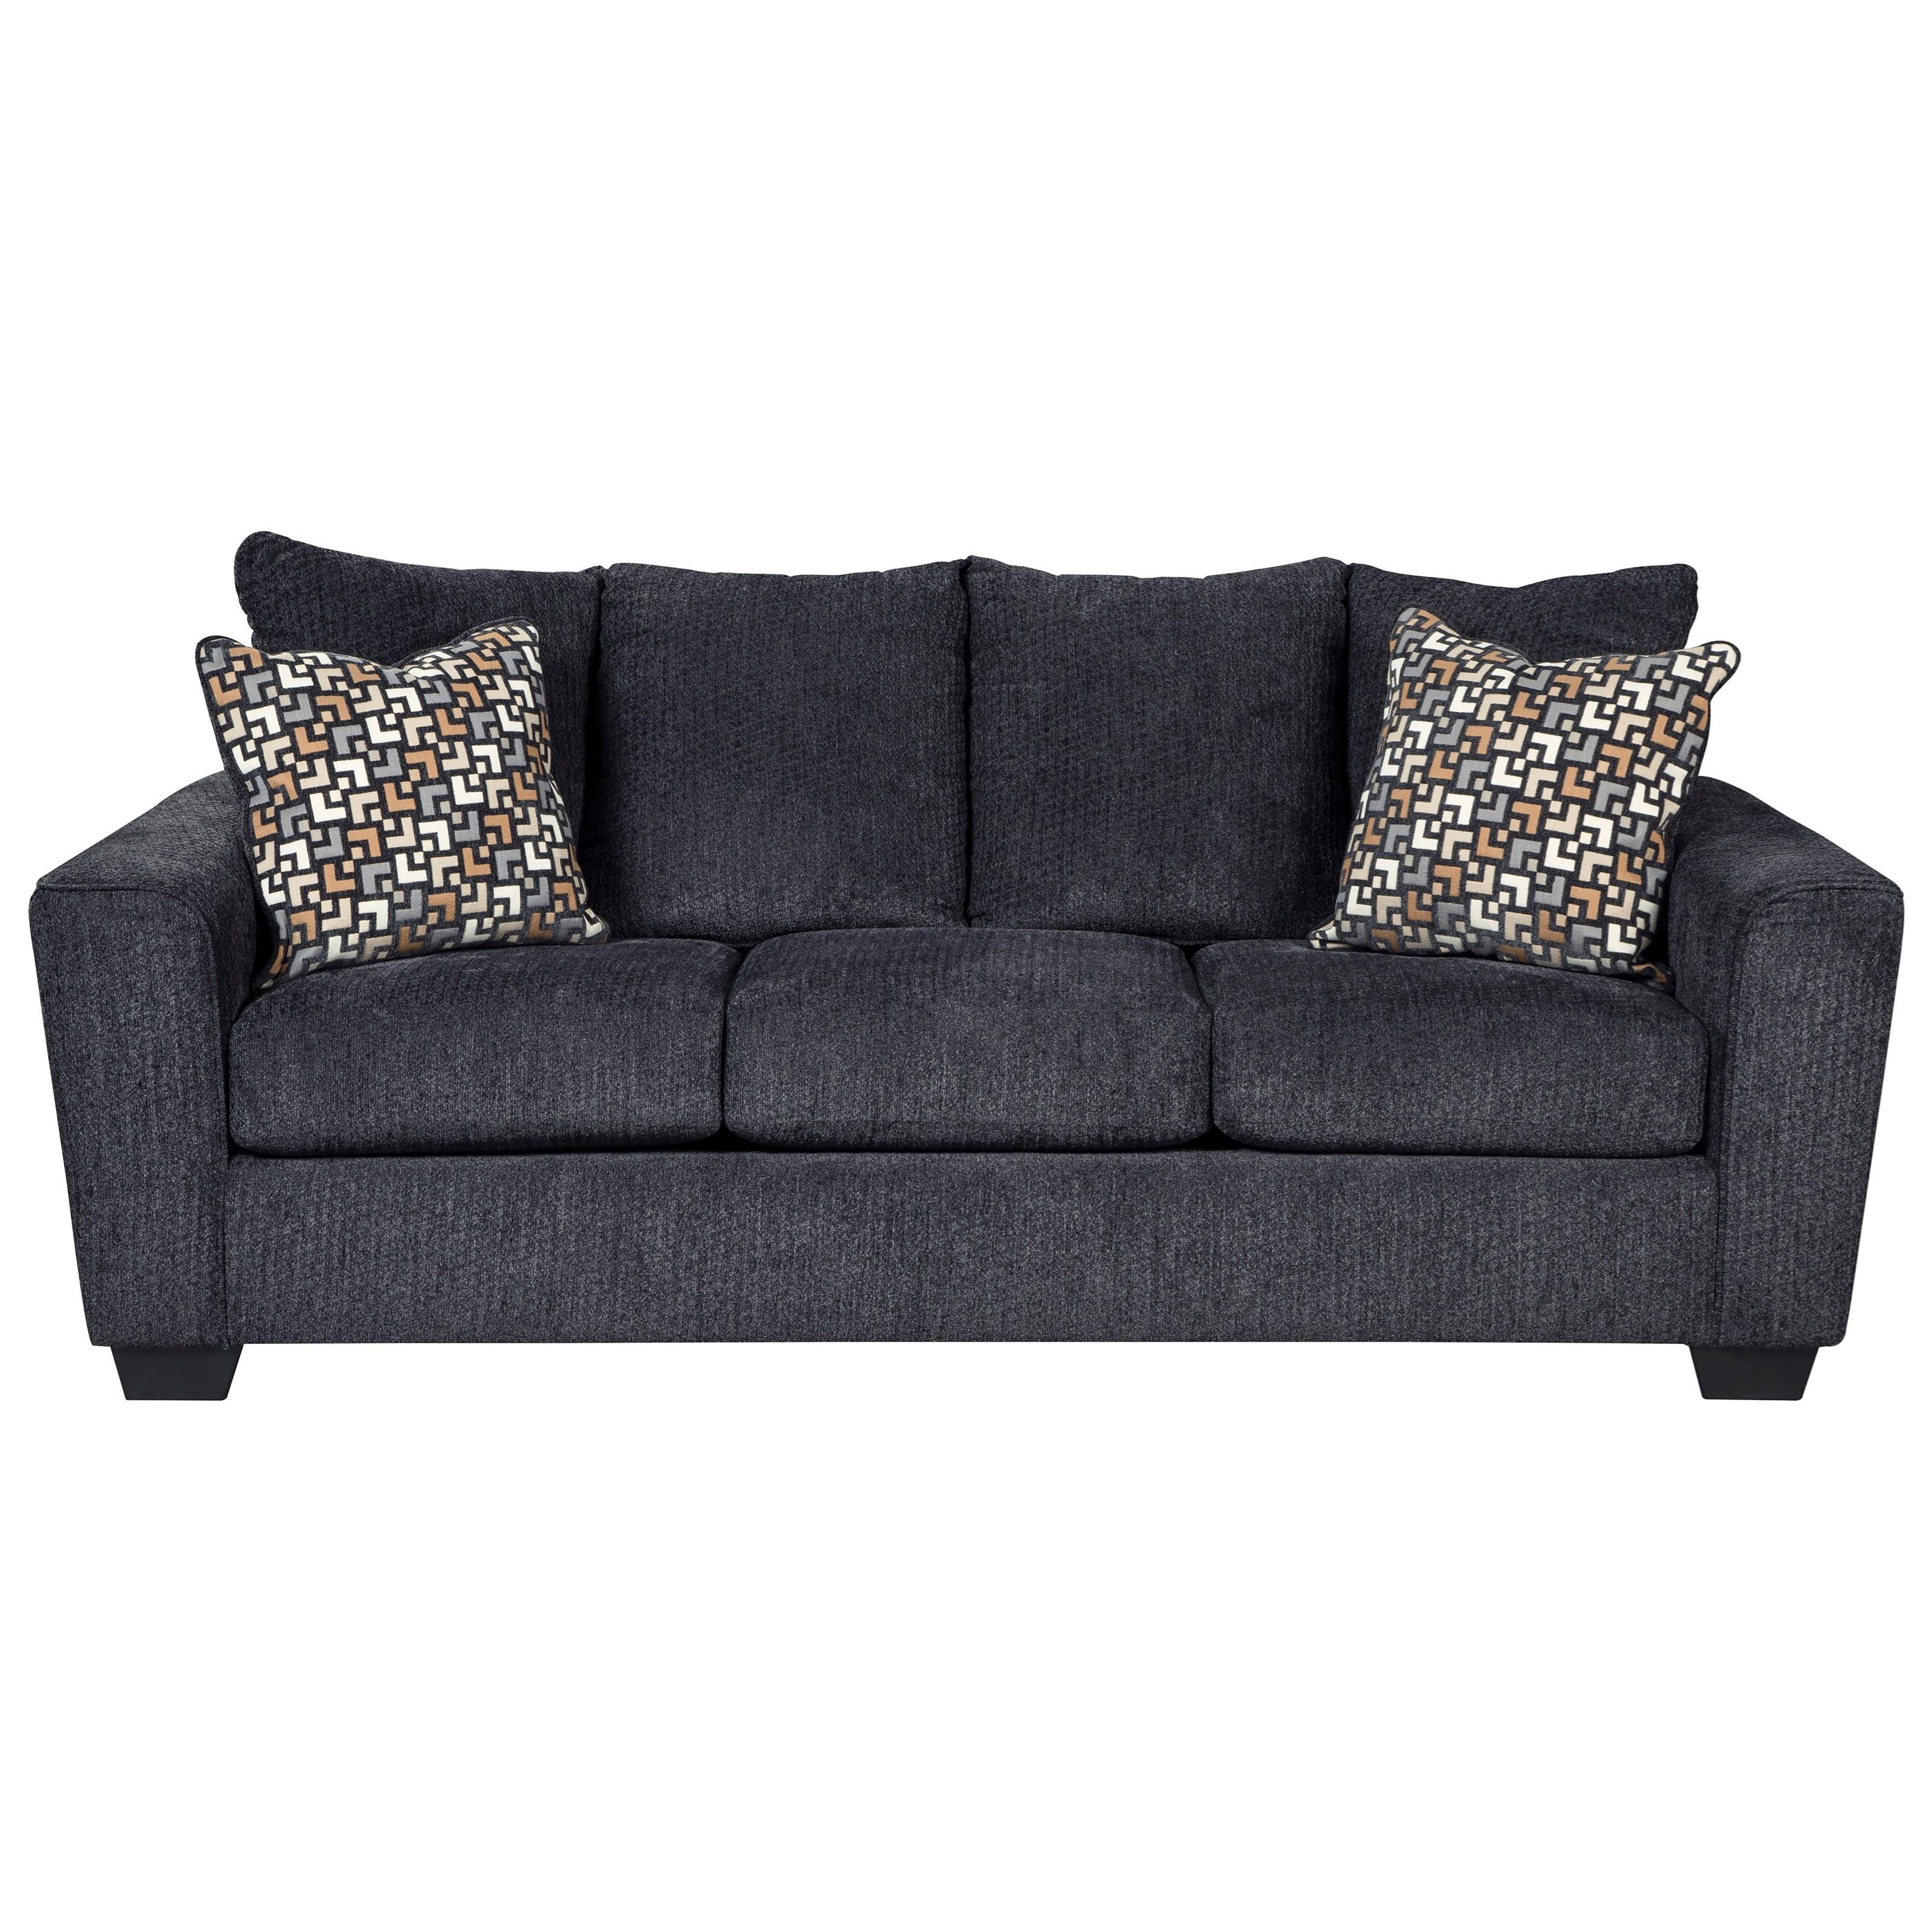 Benchcraft Wixon Queen Sofa Sleeper with Memory Foam Mattress